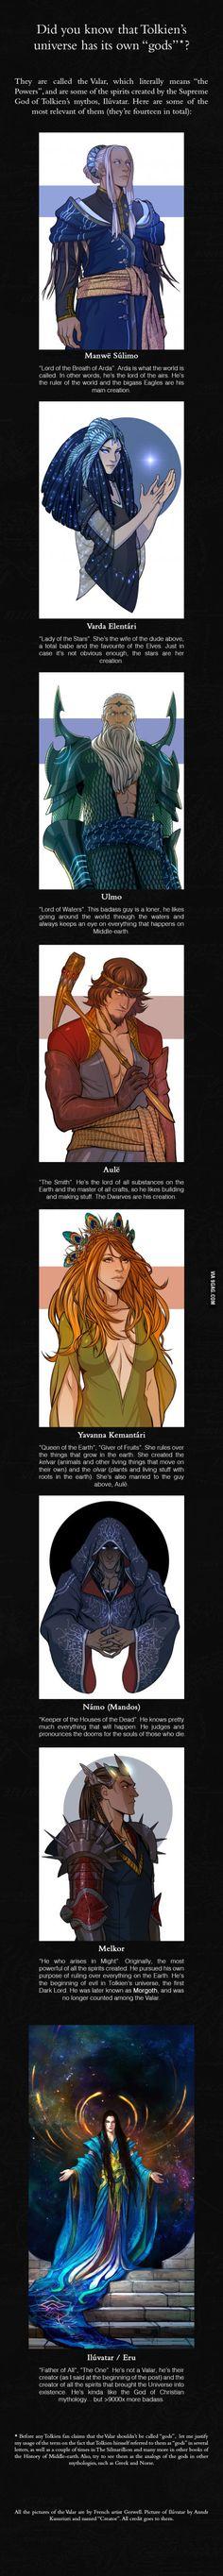 J.R.R. Tolkien's mythology: The Valar